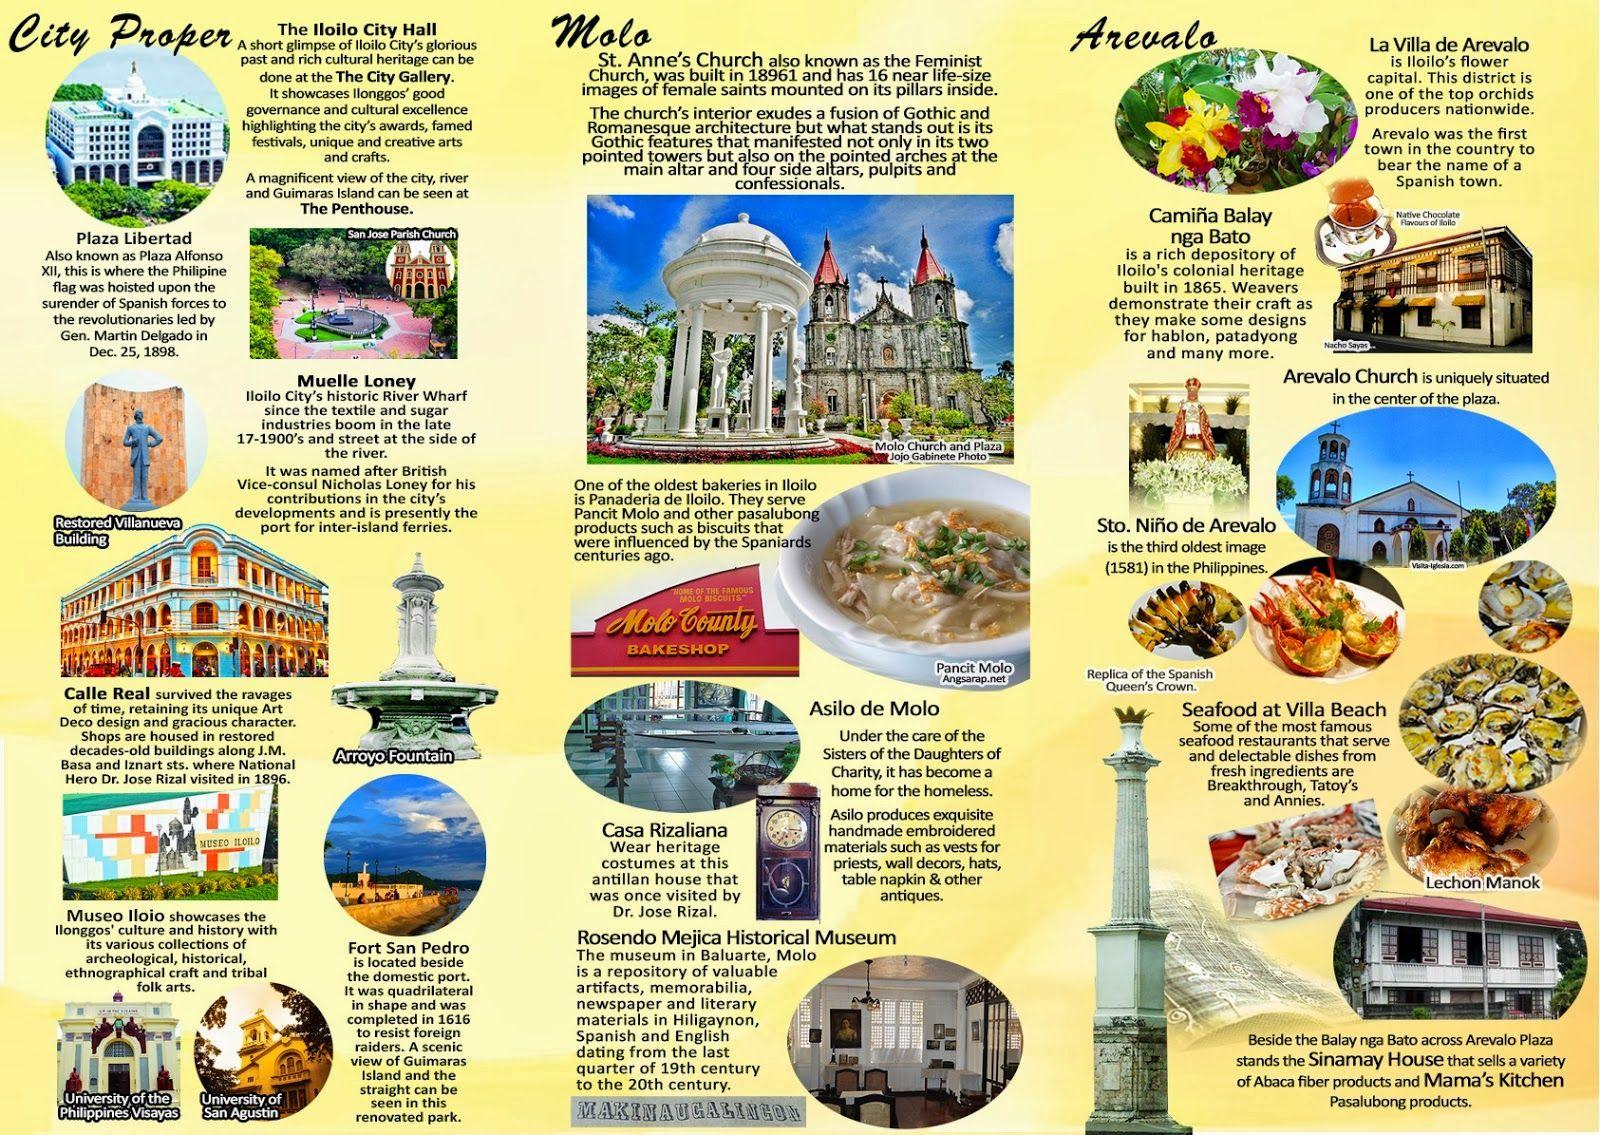 New Iloilo City Tourism Brochure Now Available For Download Iloilo Dinagyang 2015 Jeetu